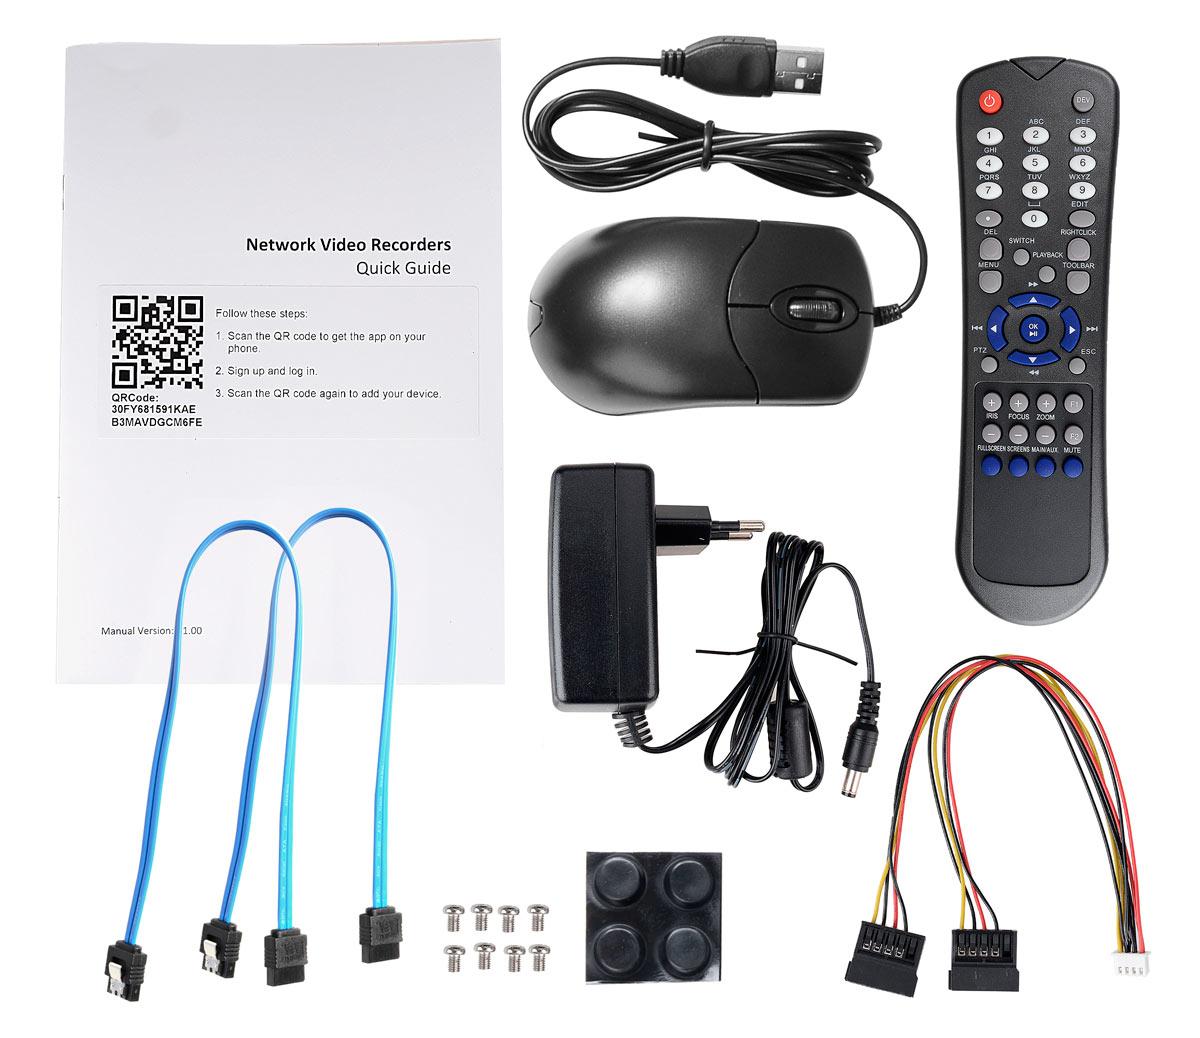 Akcesoria rejestratora BCS-PNVR3202